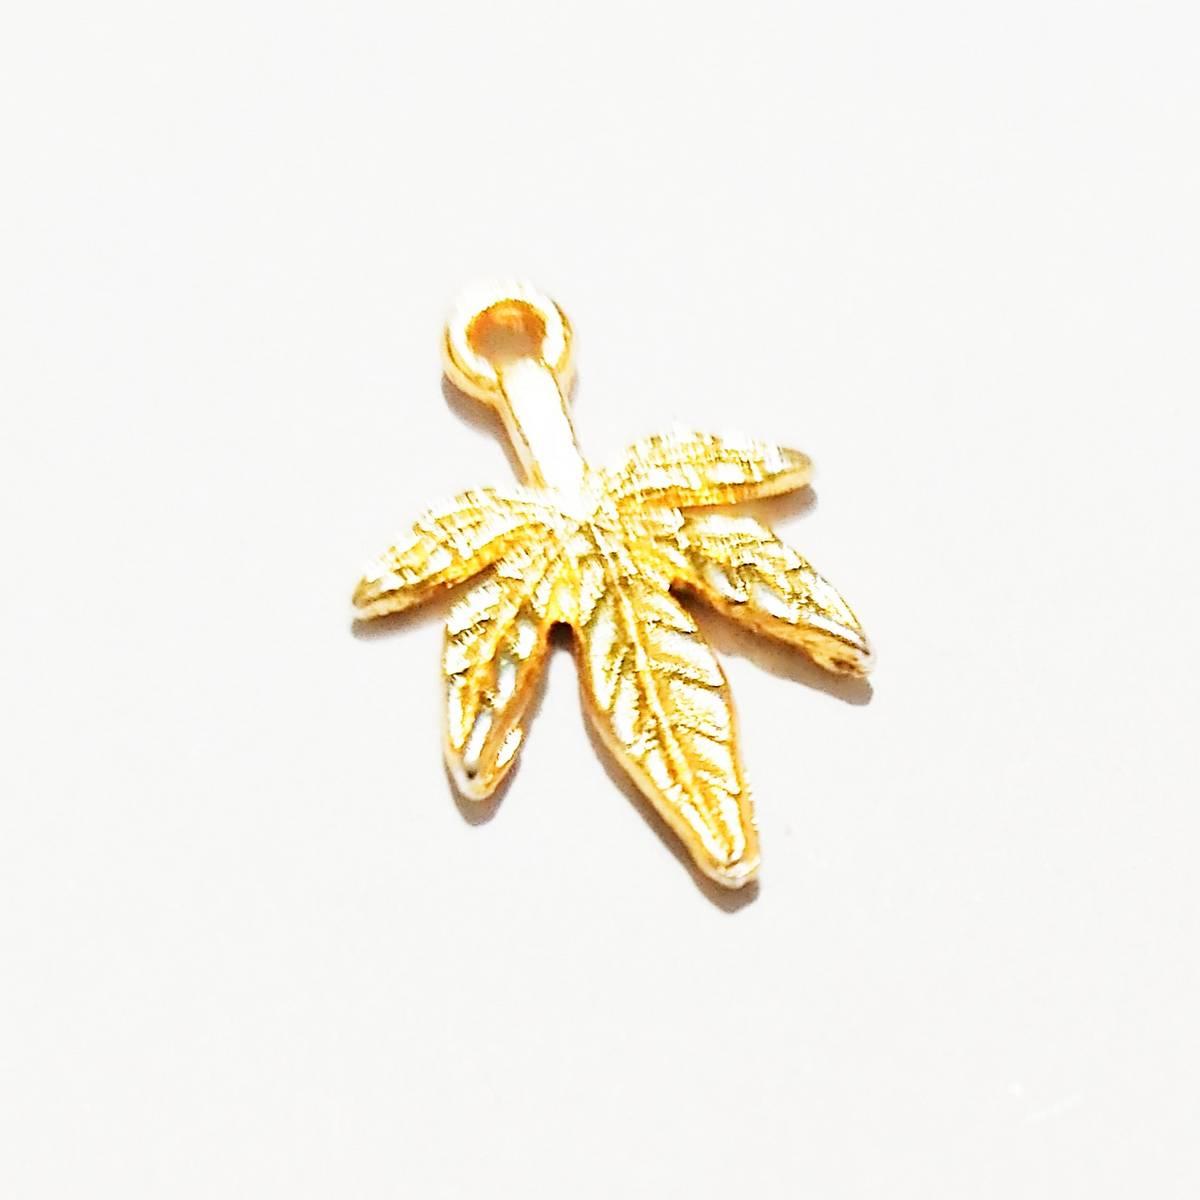 5pcs Golden Color Zinc Alloy Mini Tree Leaf Charms Fit DIY Jewelry Pendant Charms Making